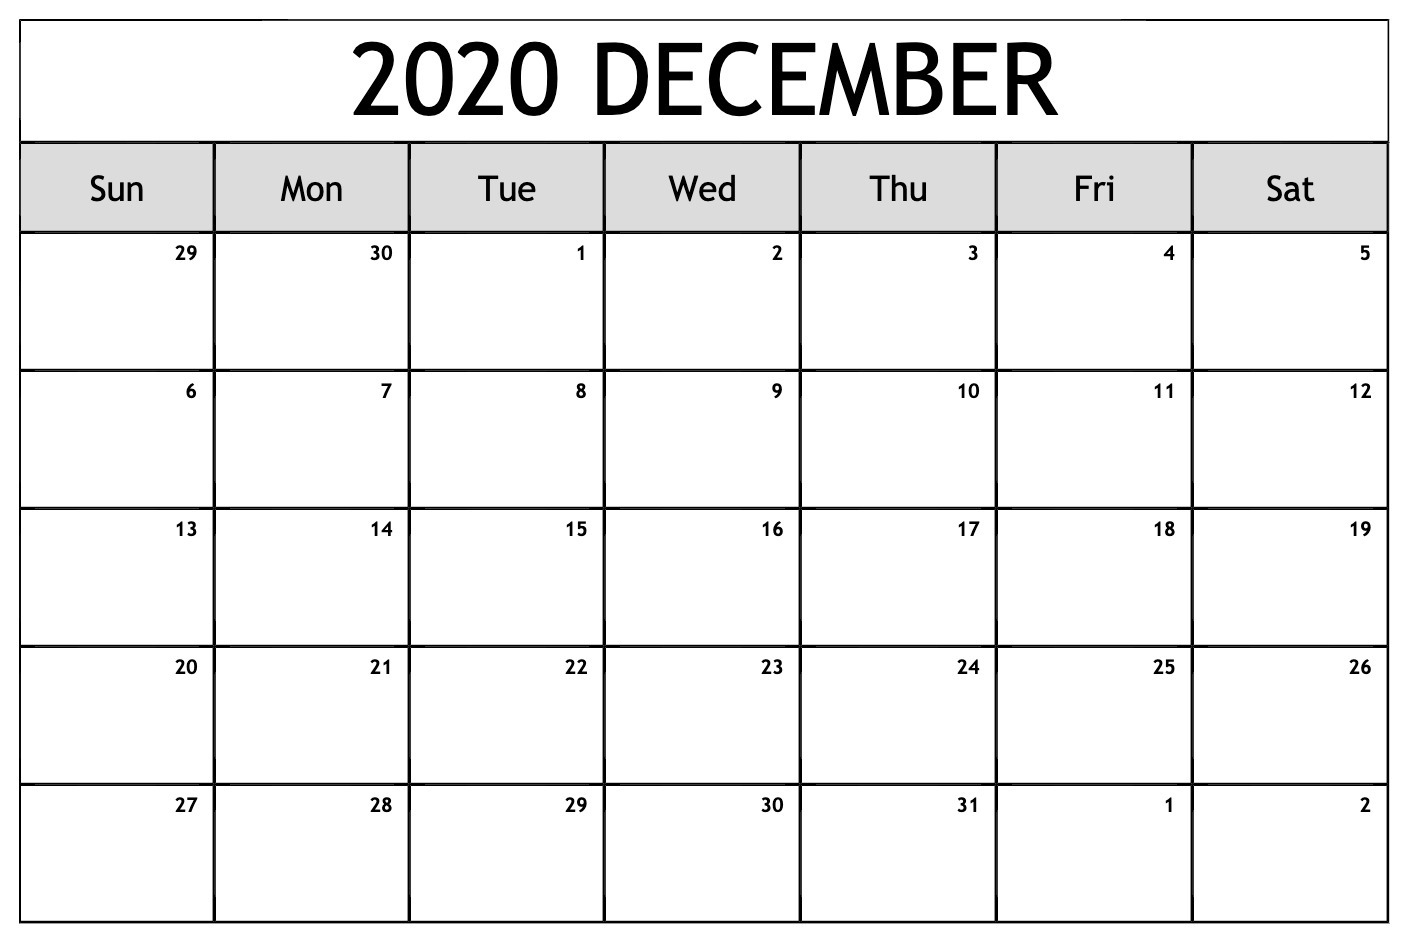 Free Printable December Calendar 2020 Templates Pdf, Word, Excel